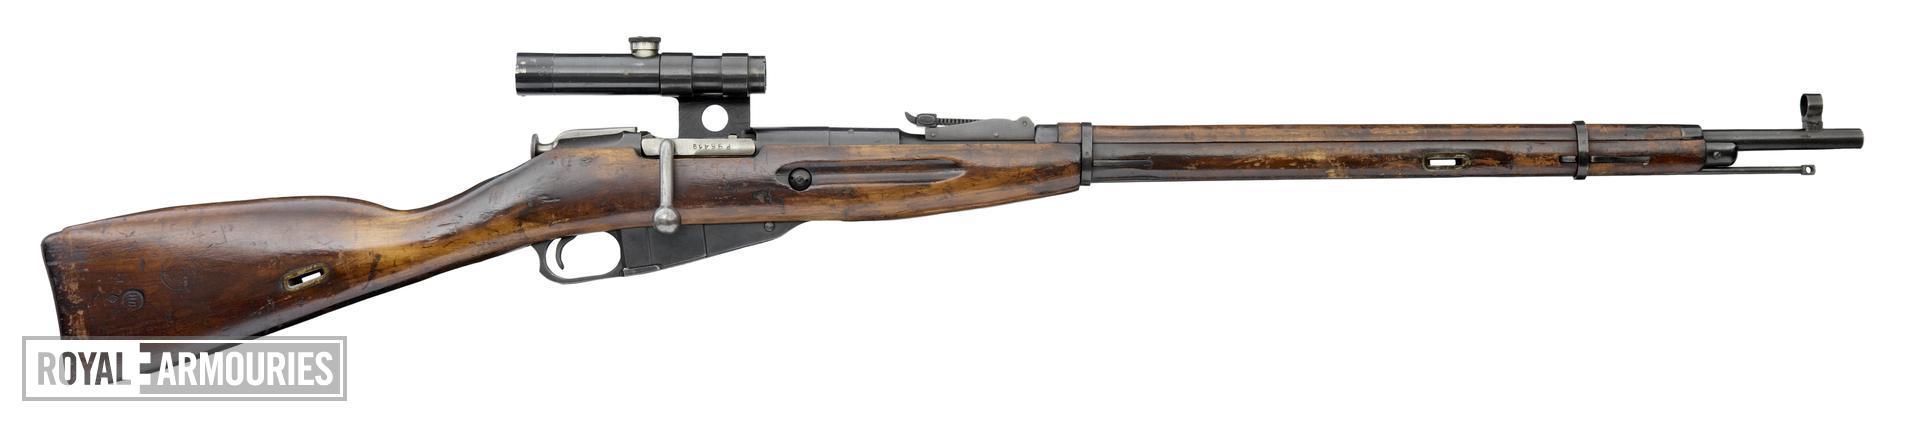 Centrefire bolt-action rifle - Mosin-Nagant Model 1891/30